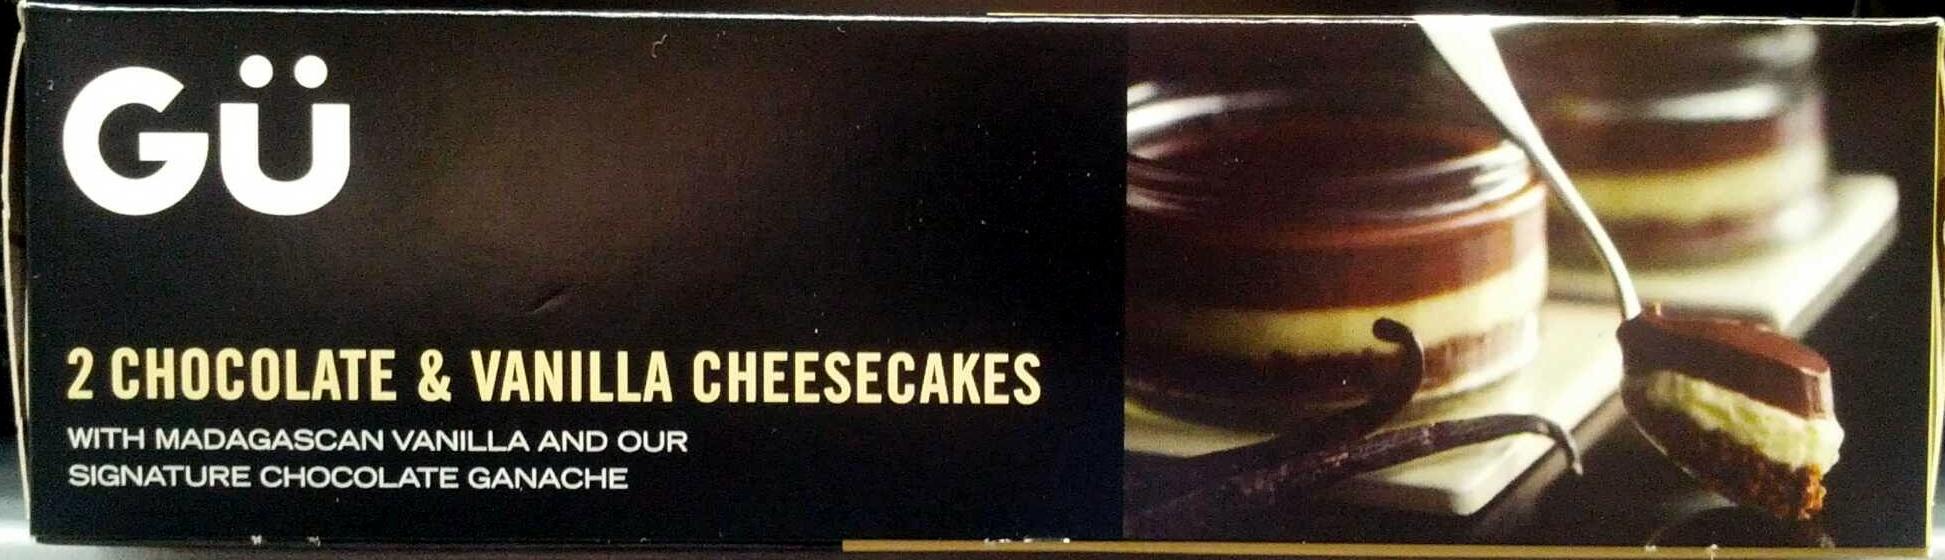 2 cheesecakes au chocolat & vanille de madagascar - Product